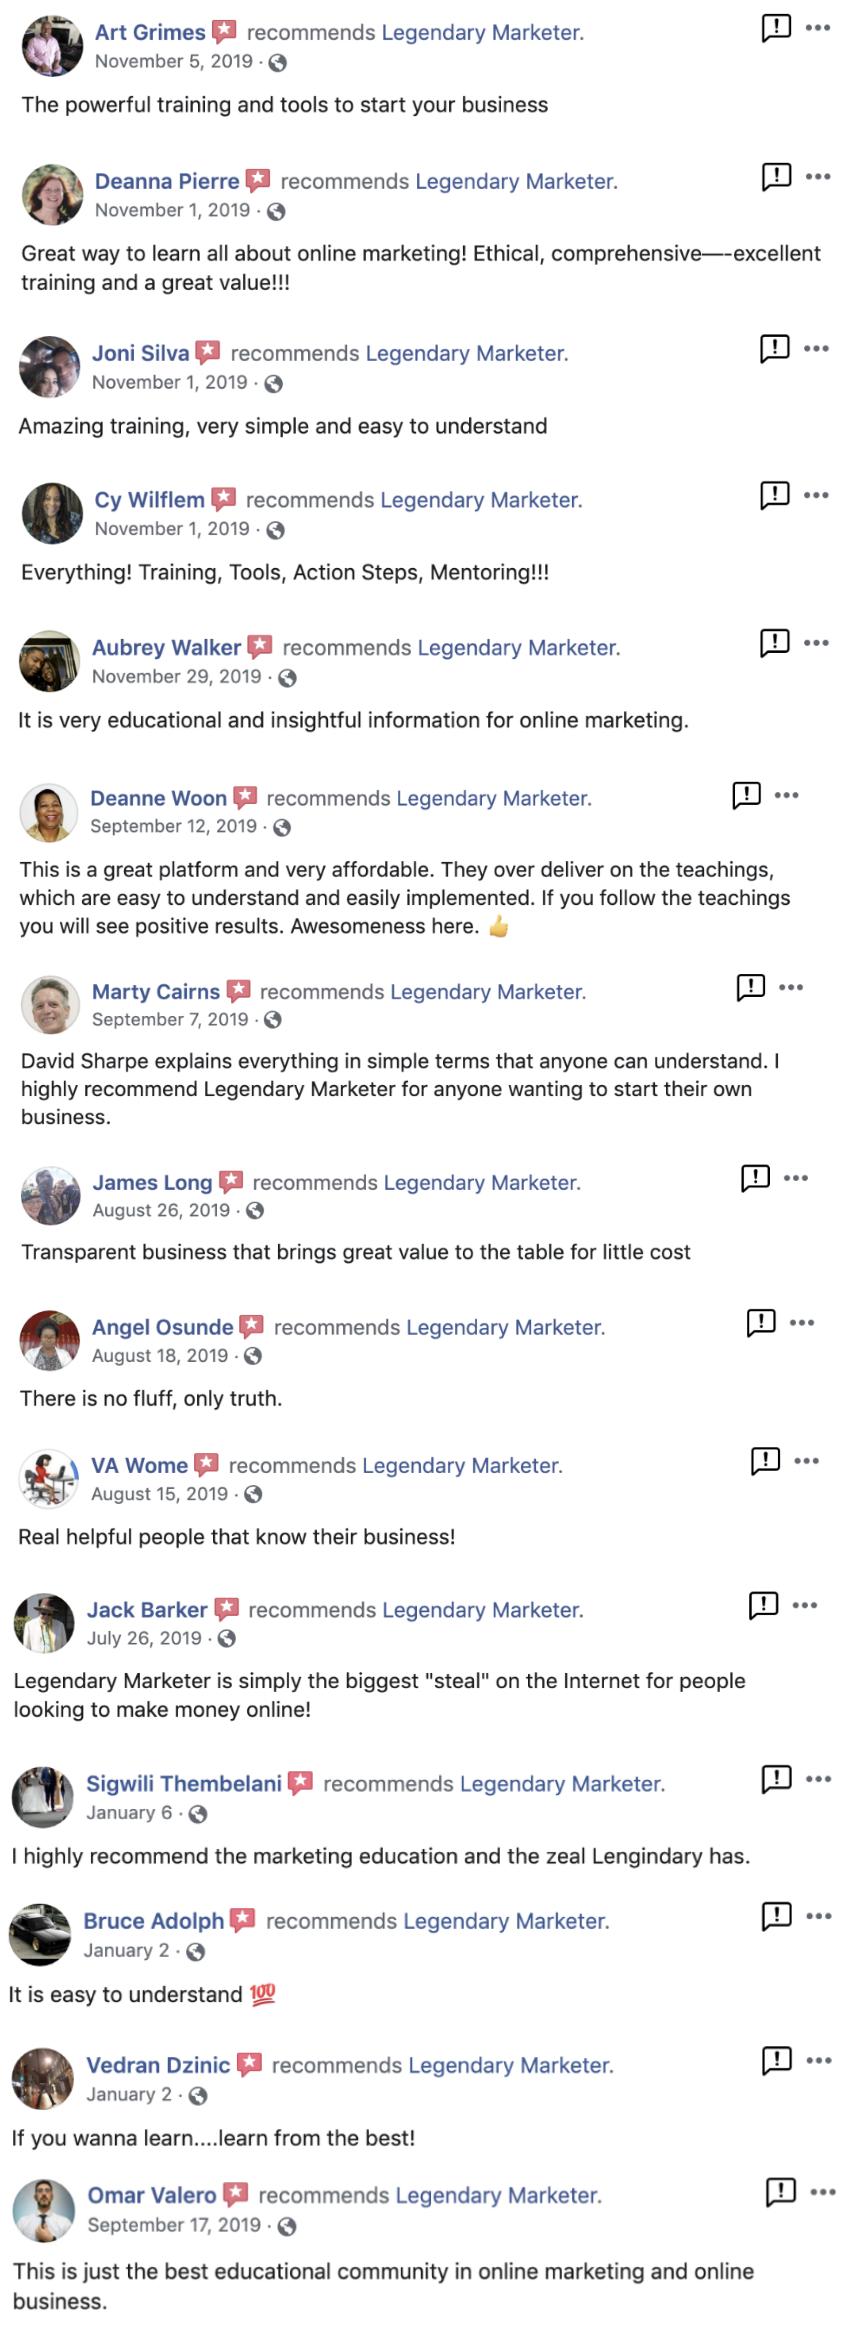 legendary marketer testimonials